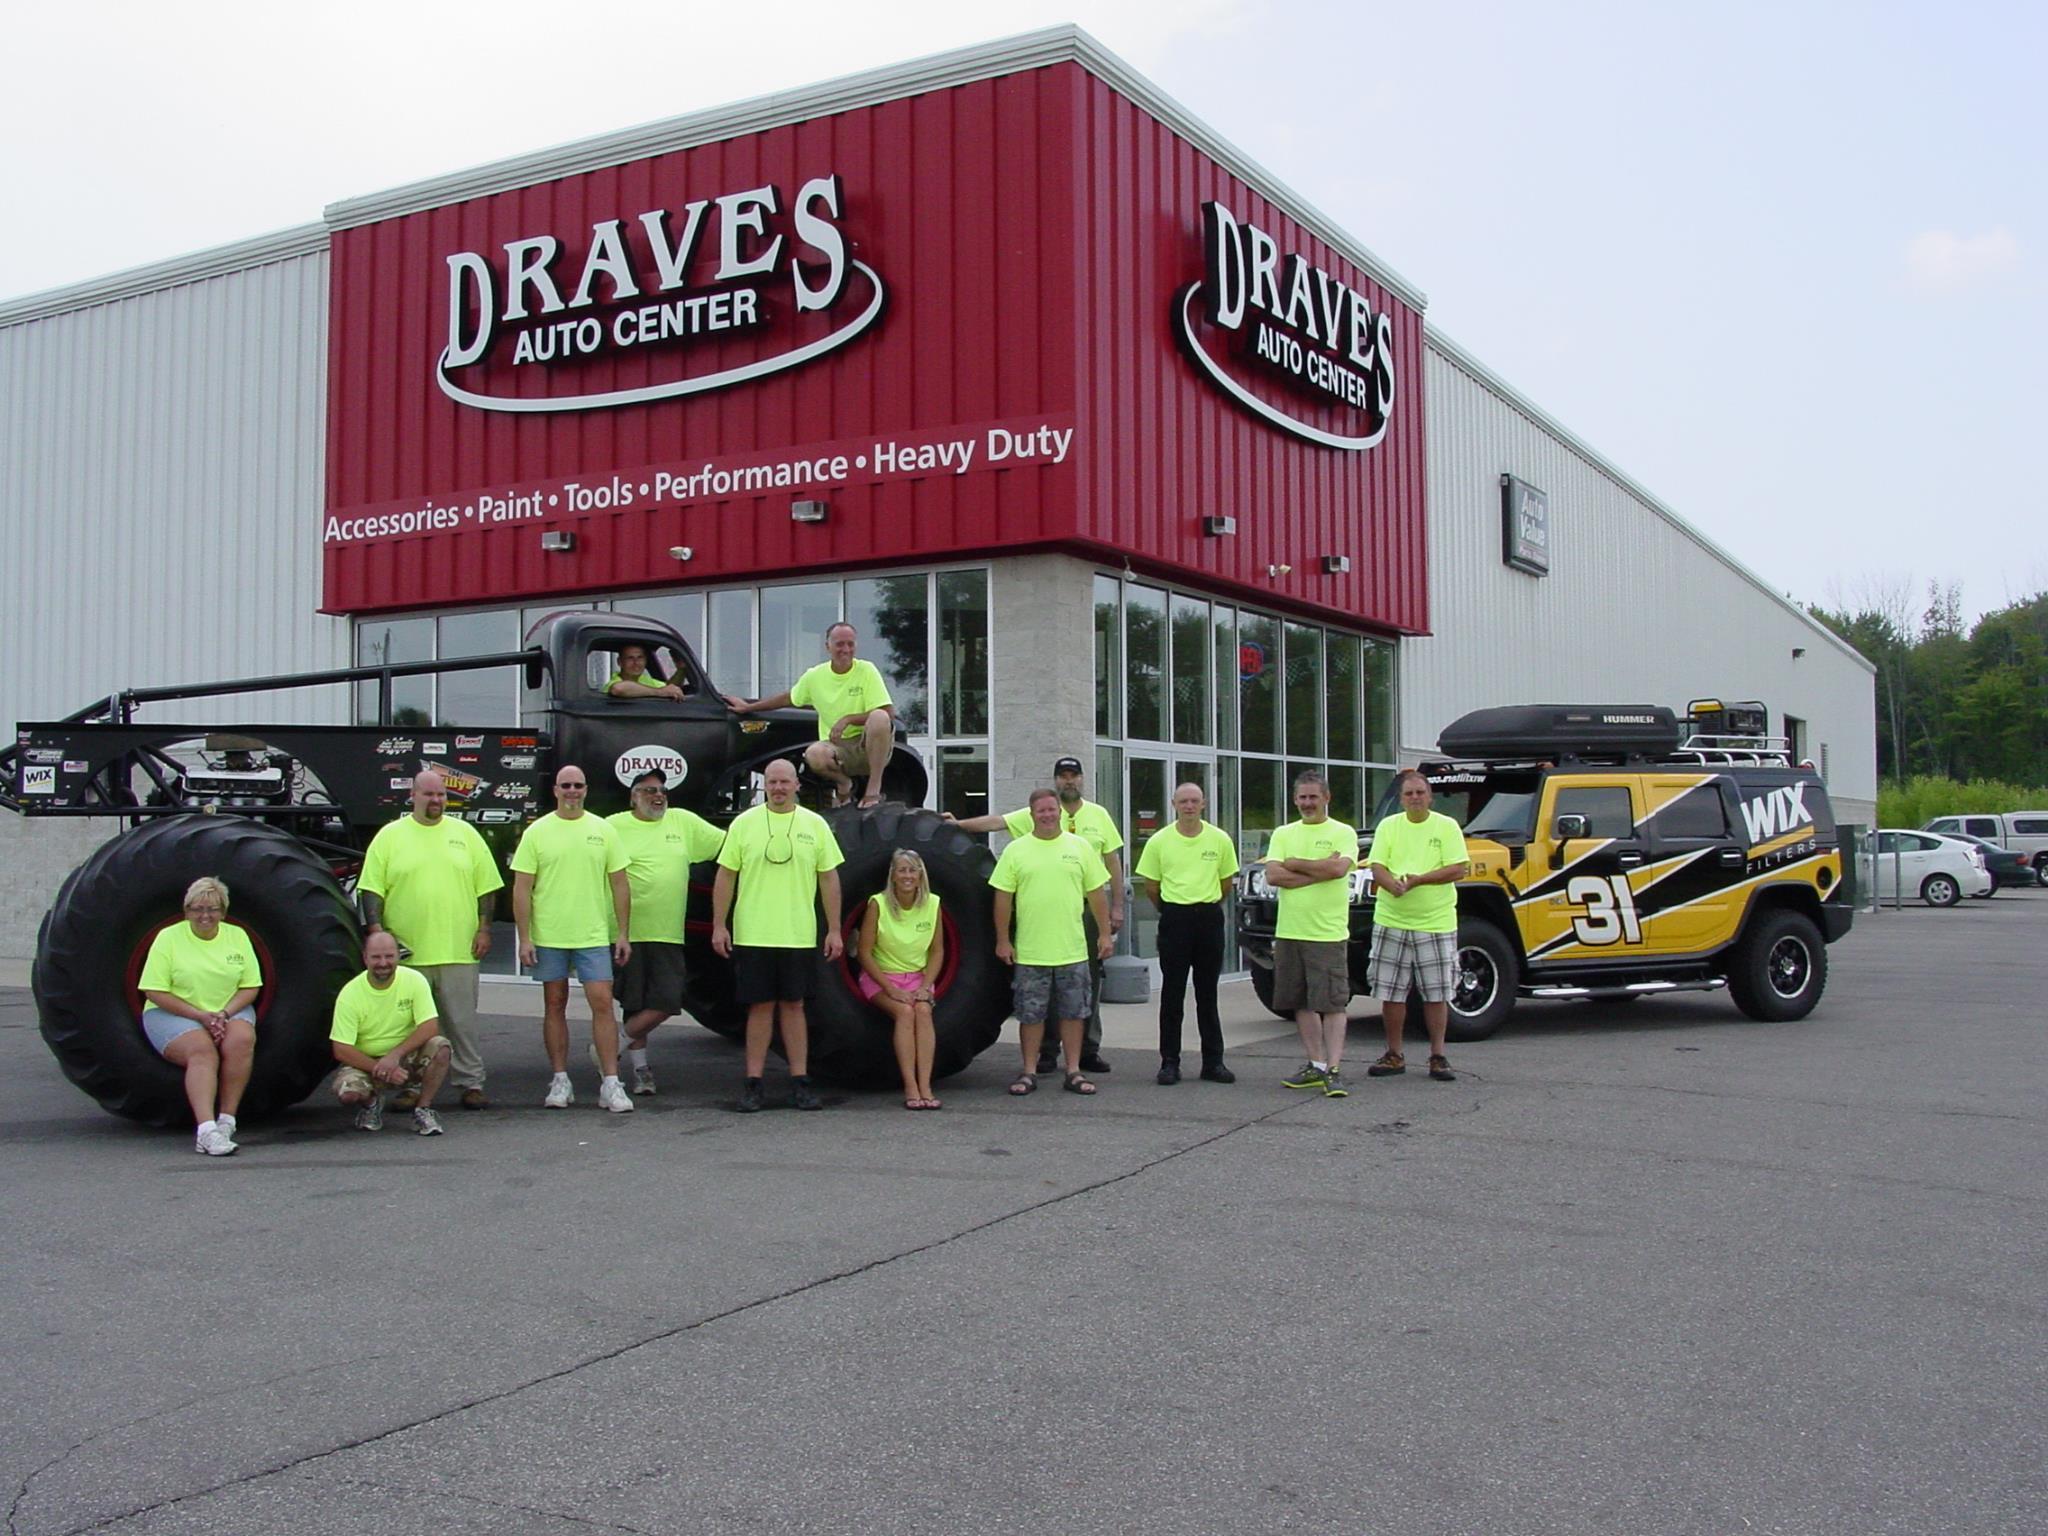 Draves Auto Center image 2